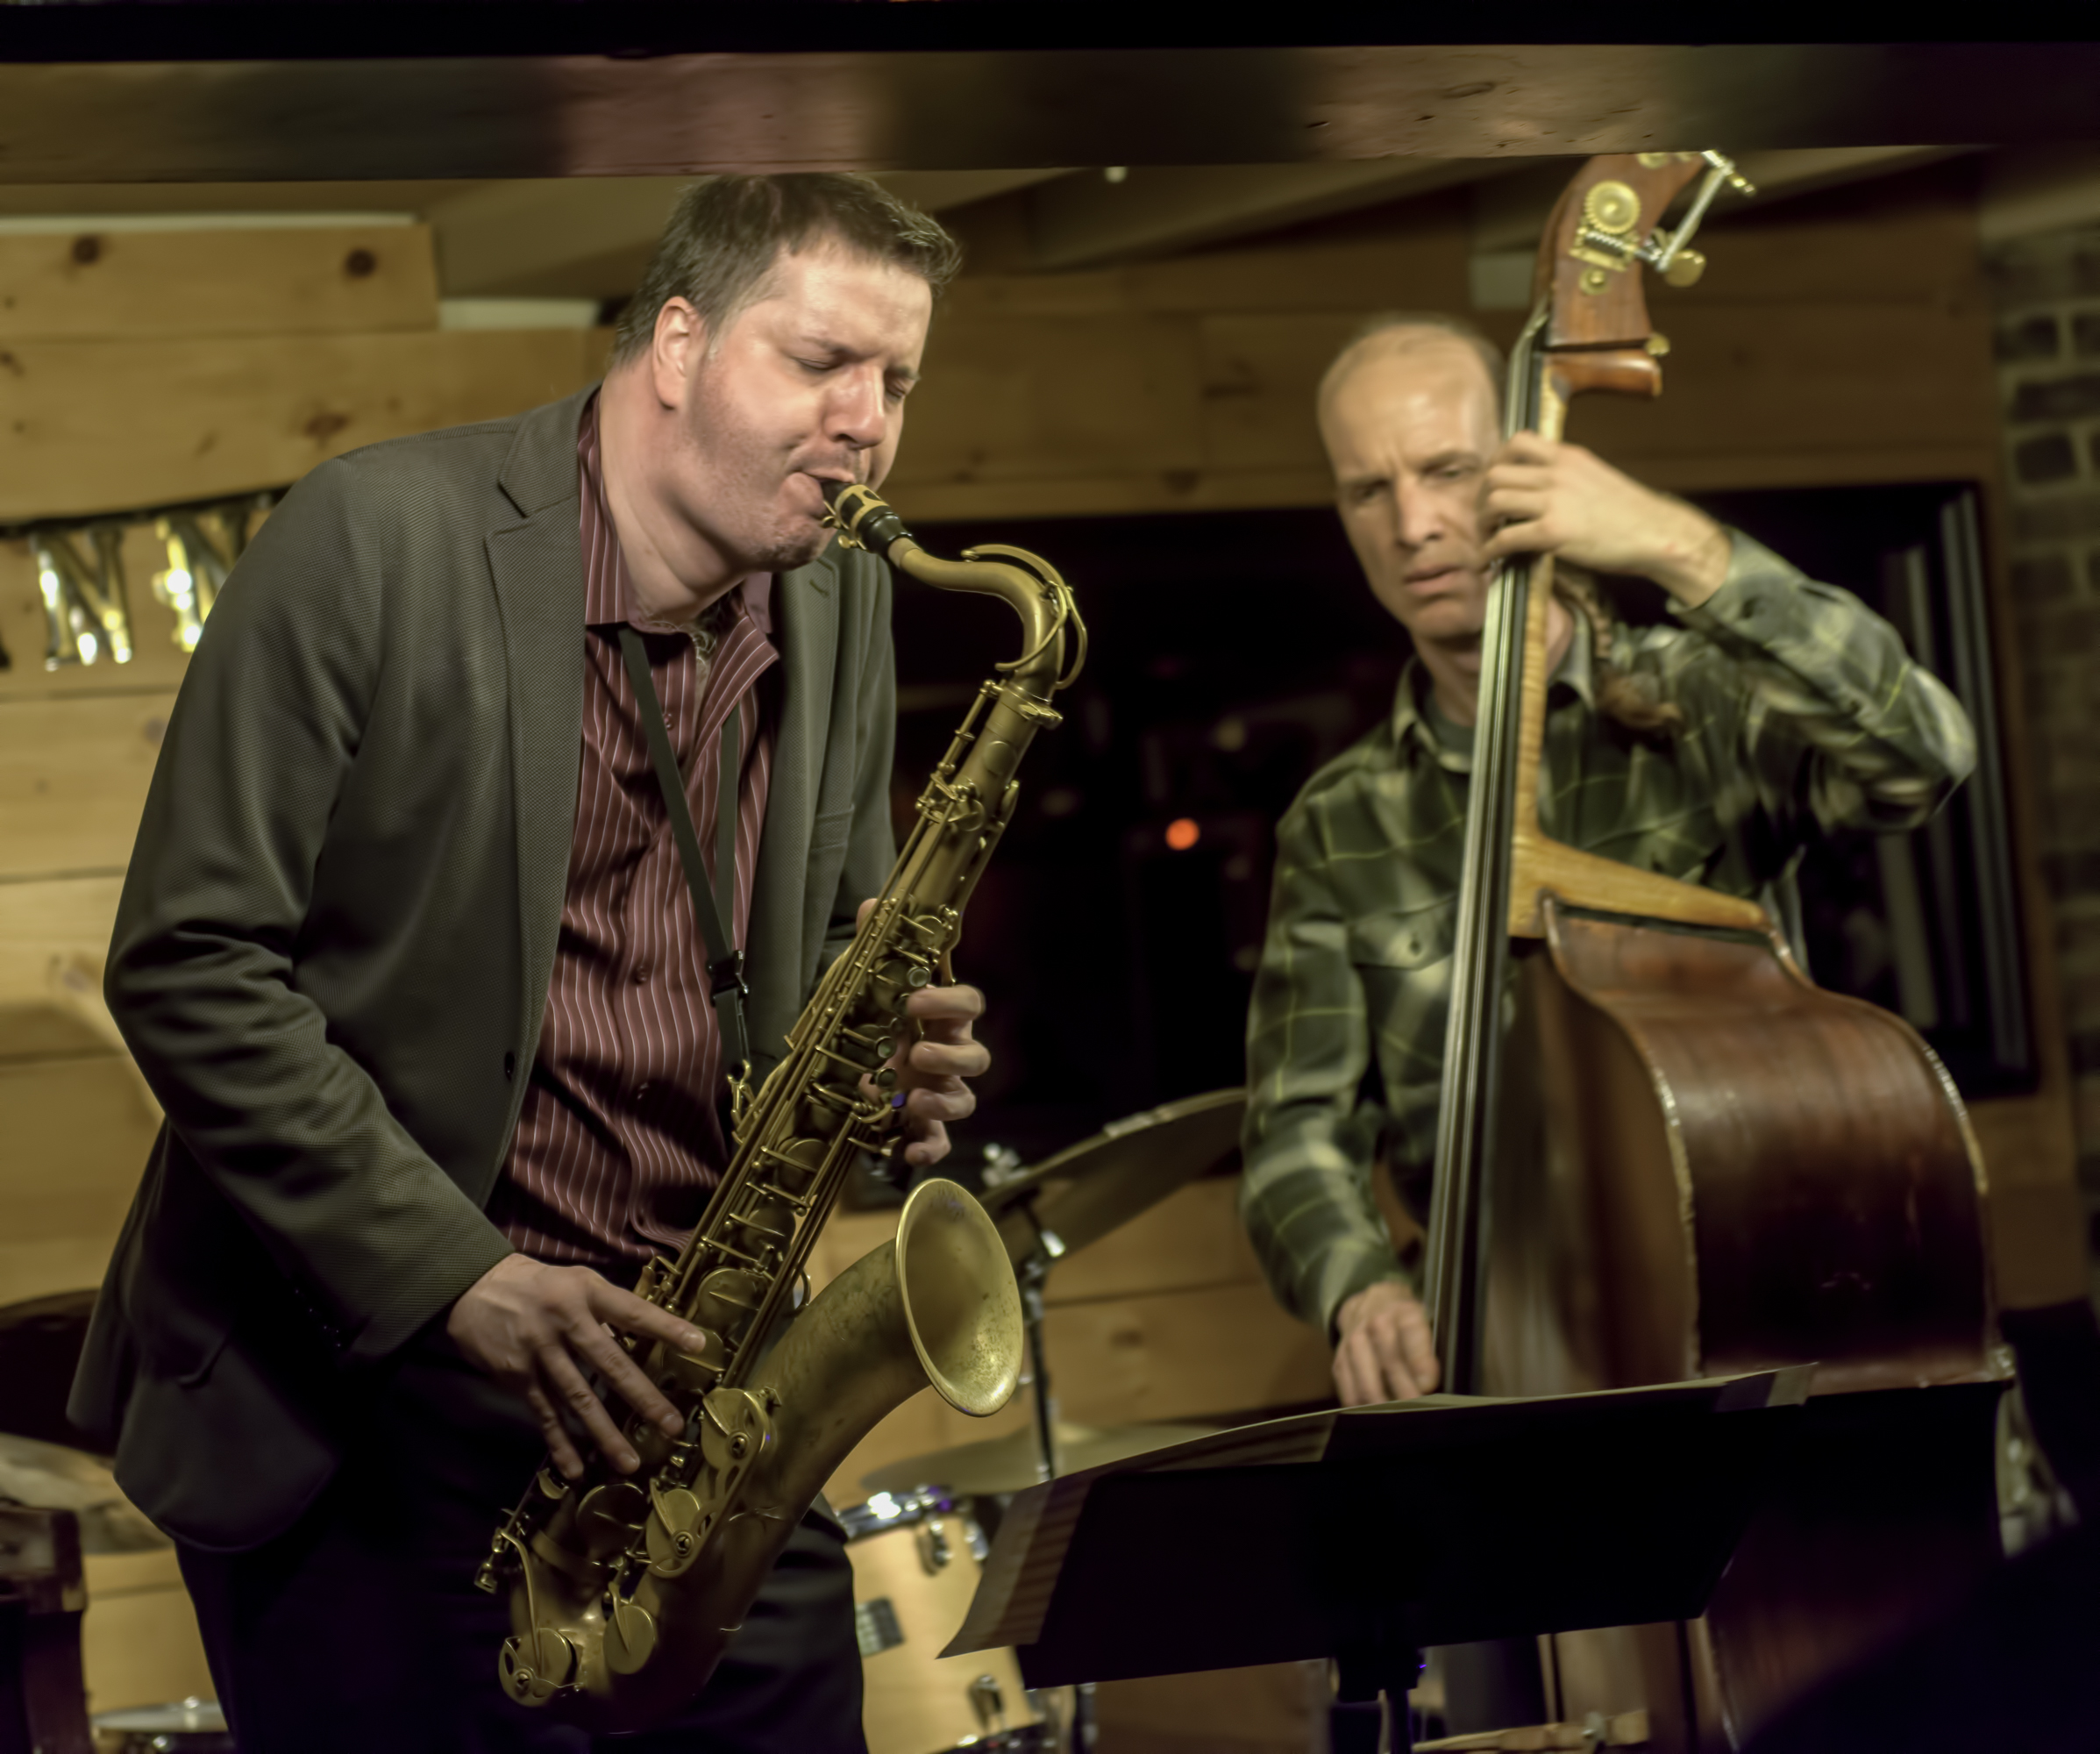 Al McLean and Fraser Hollins at Diese Onze in Montreal